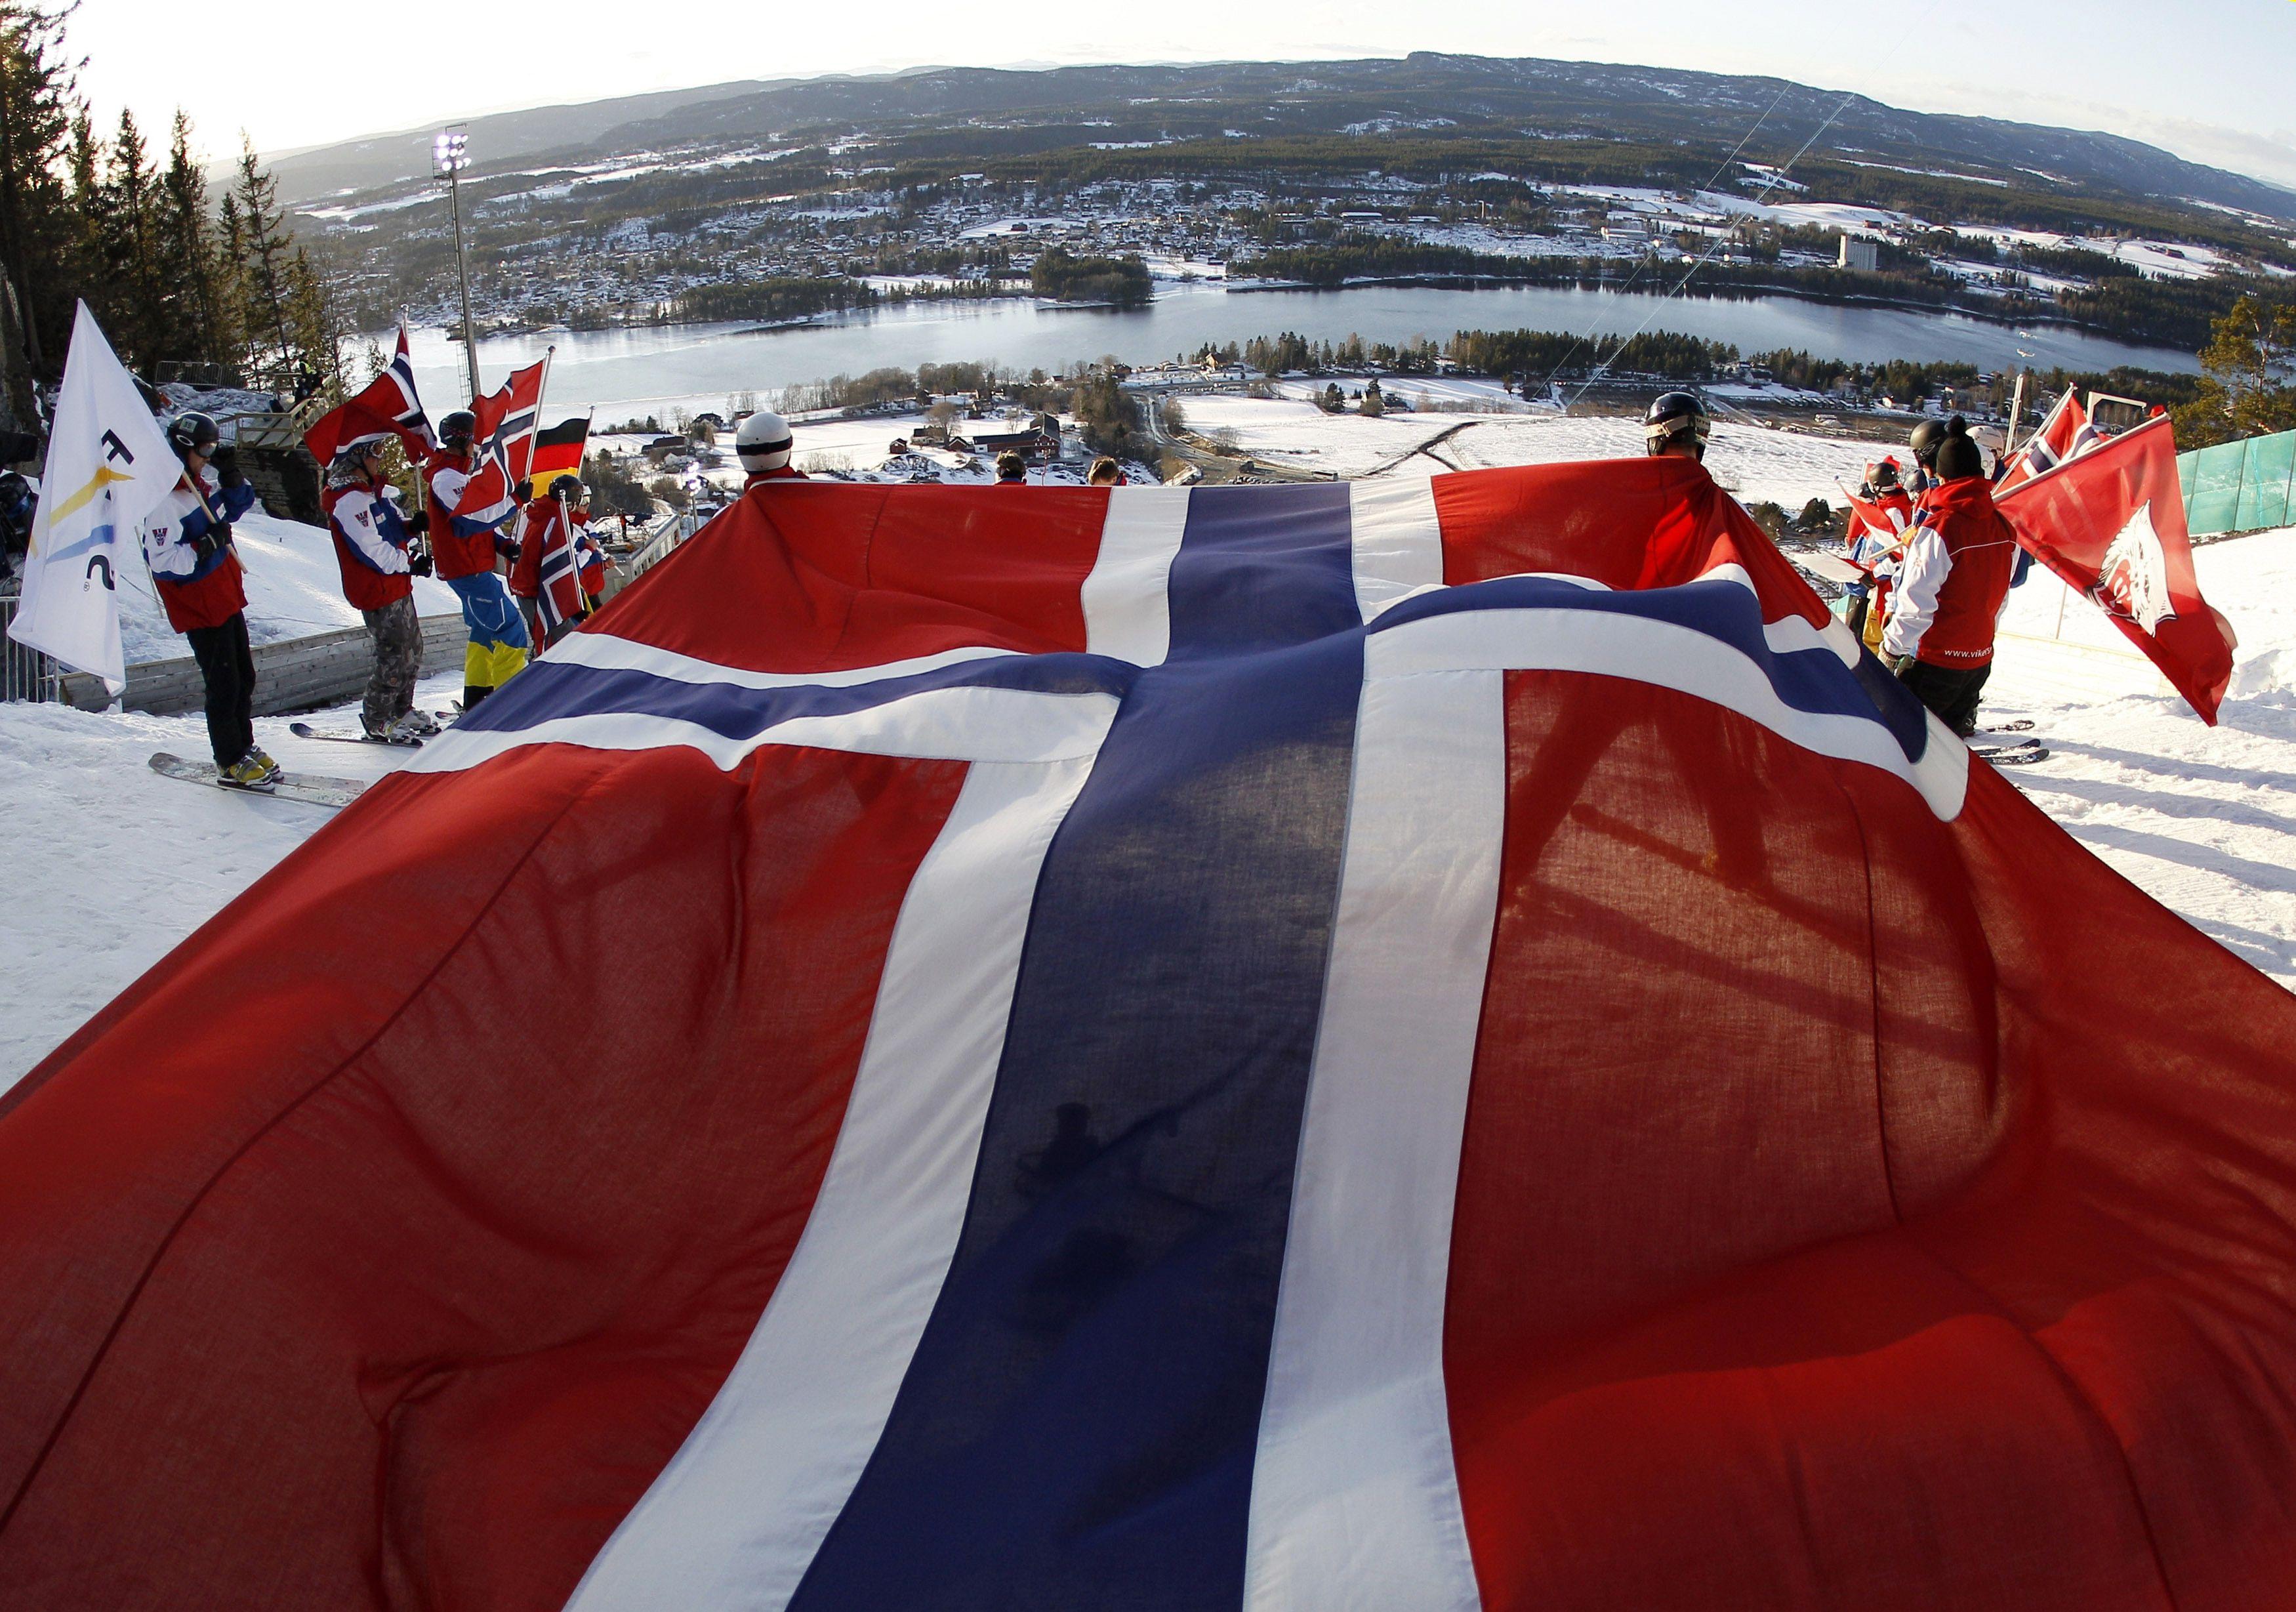 Norvegija suple�kino 32 mlrd. USD i� valstybinio naftos fondo